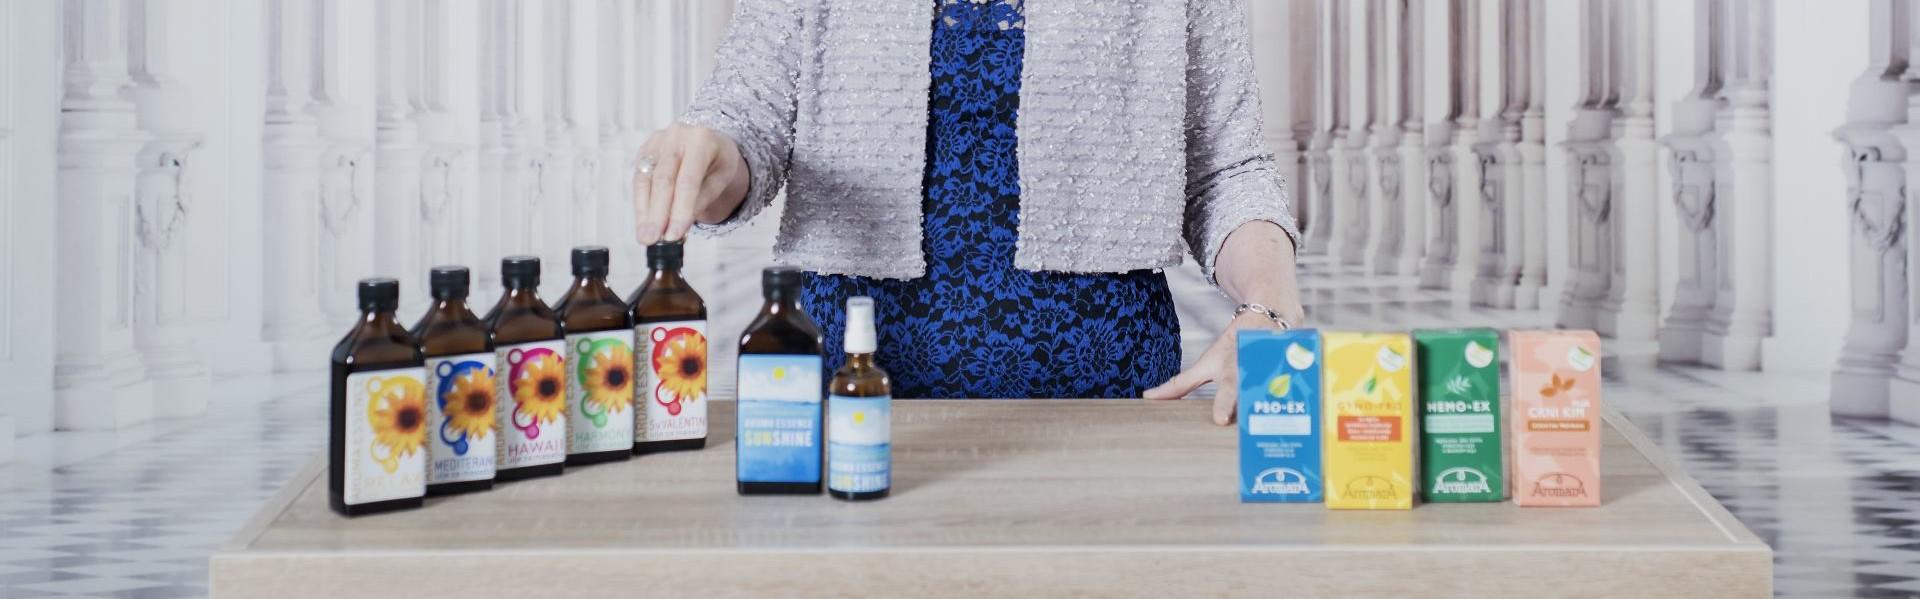 AROMARA Mala škola aromaterapije s Marom